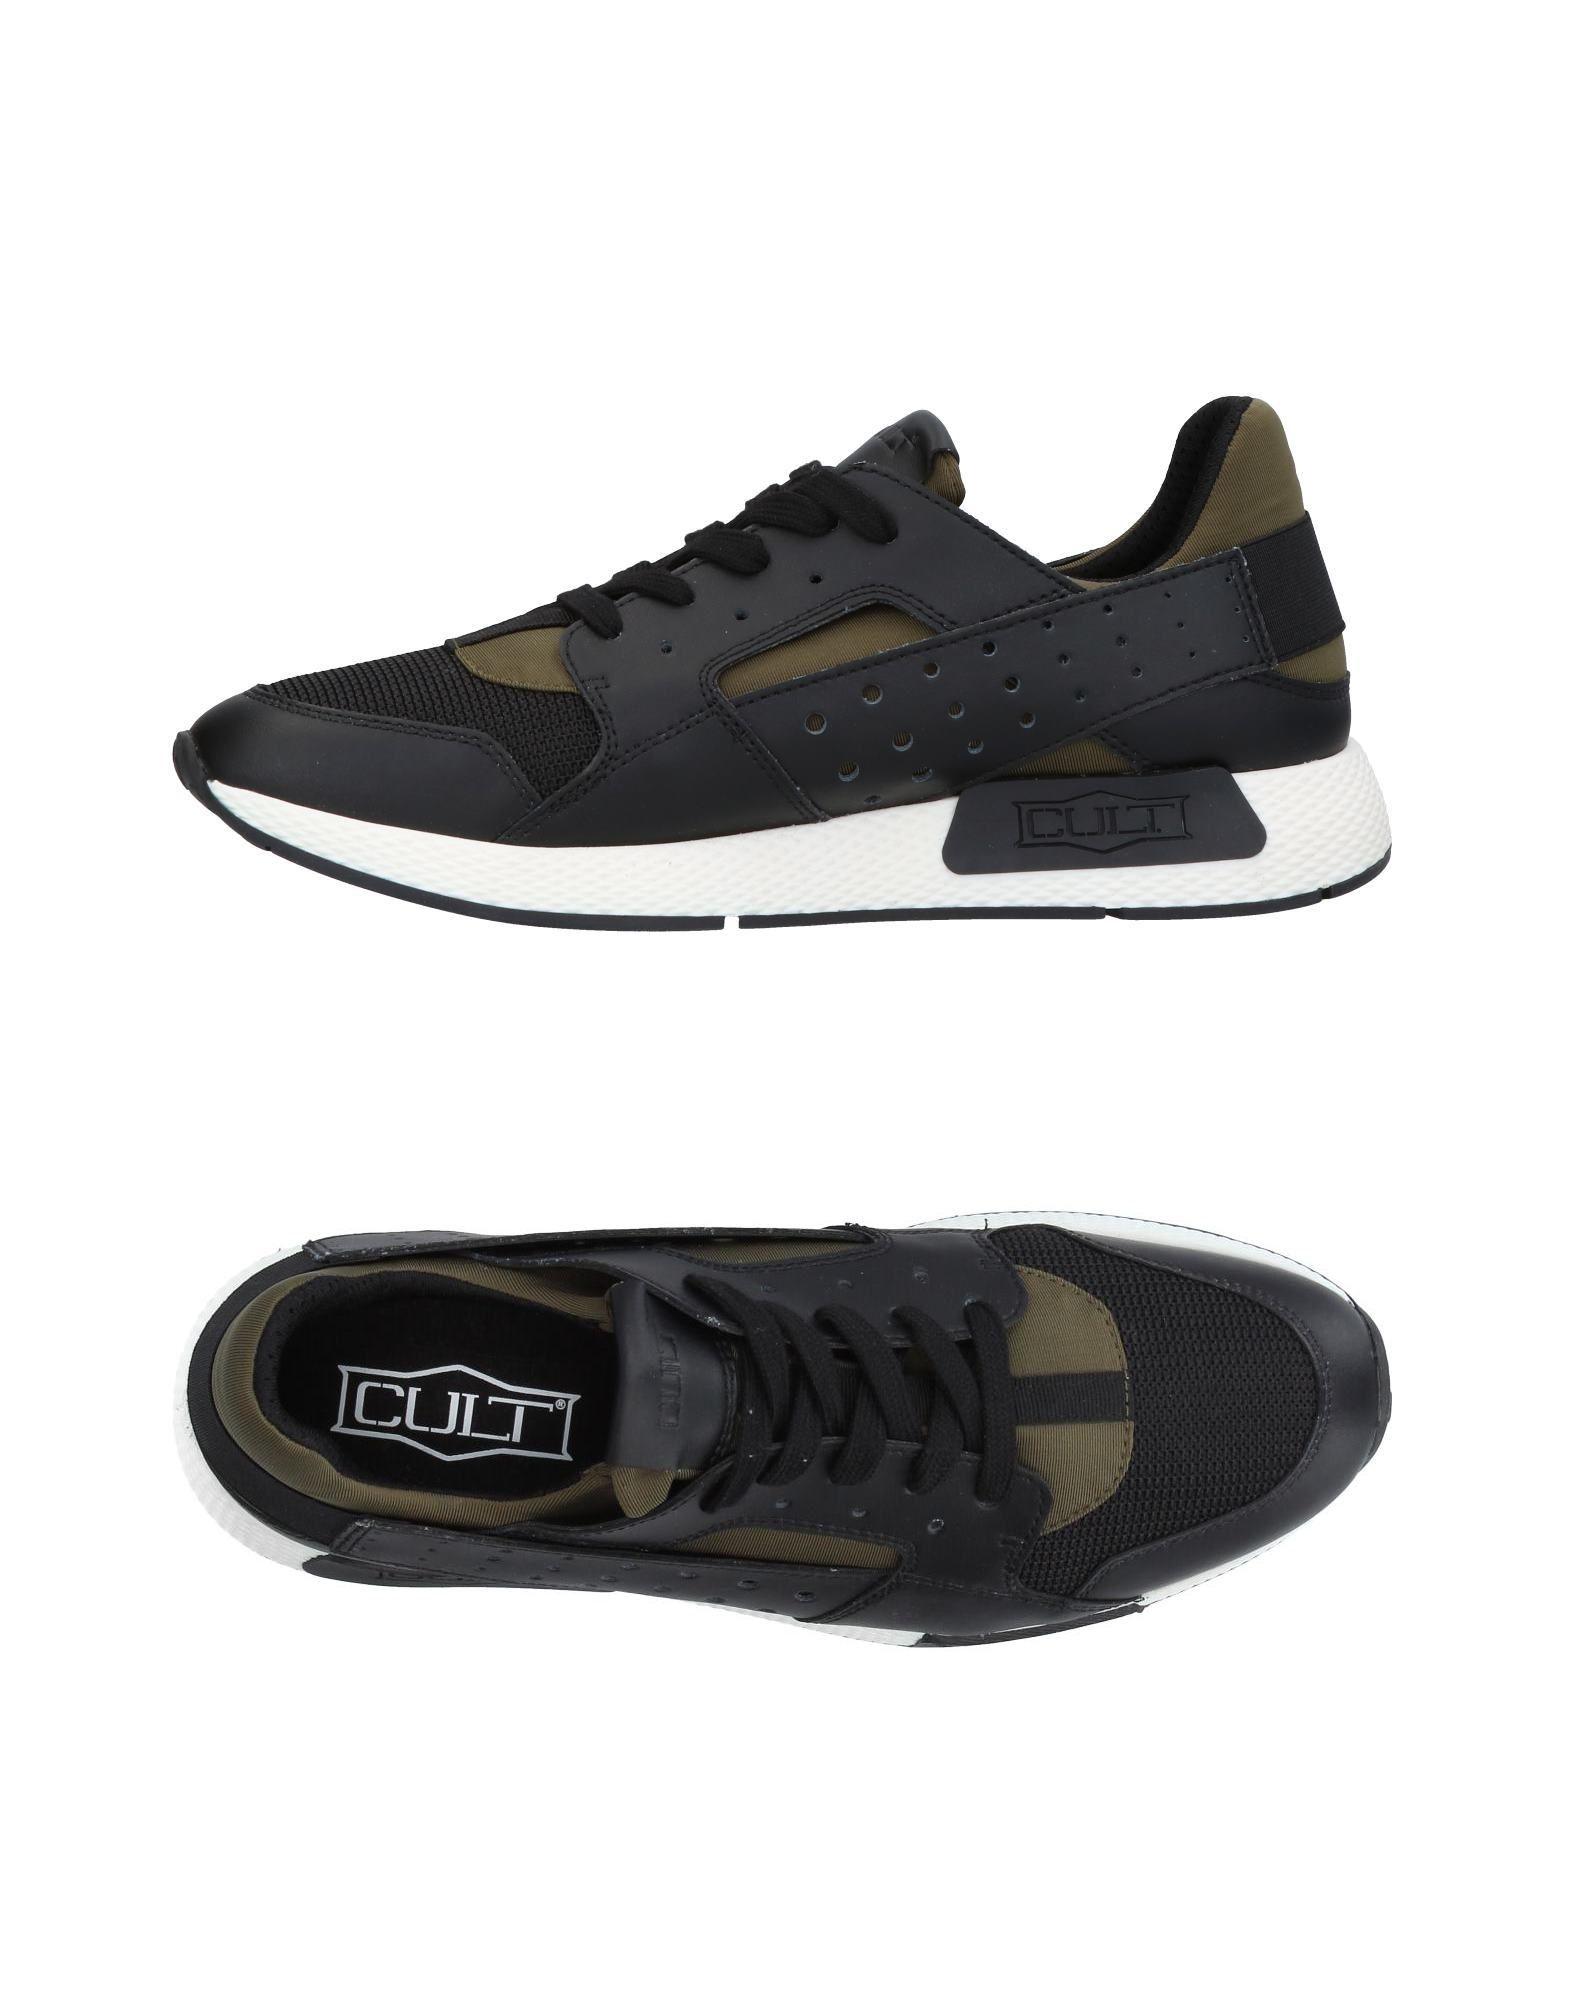 CULT Herren Low Sneakers & Tennisschuhe Farbe Schwarz Größe 15 - broschei